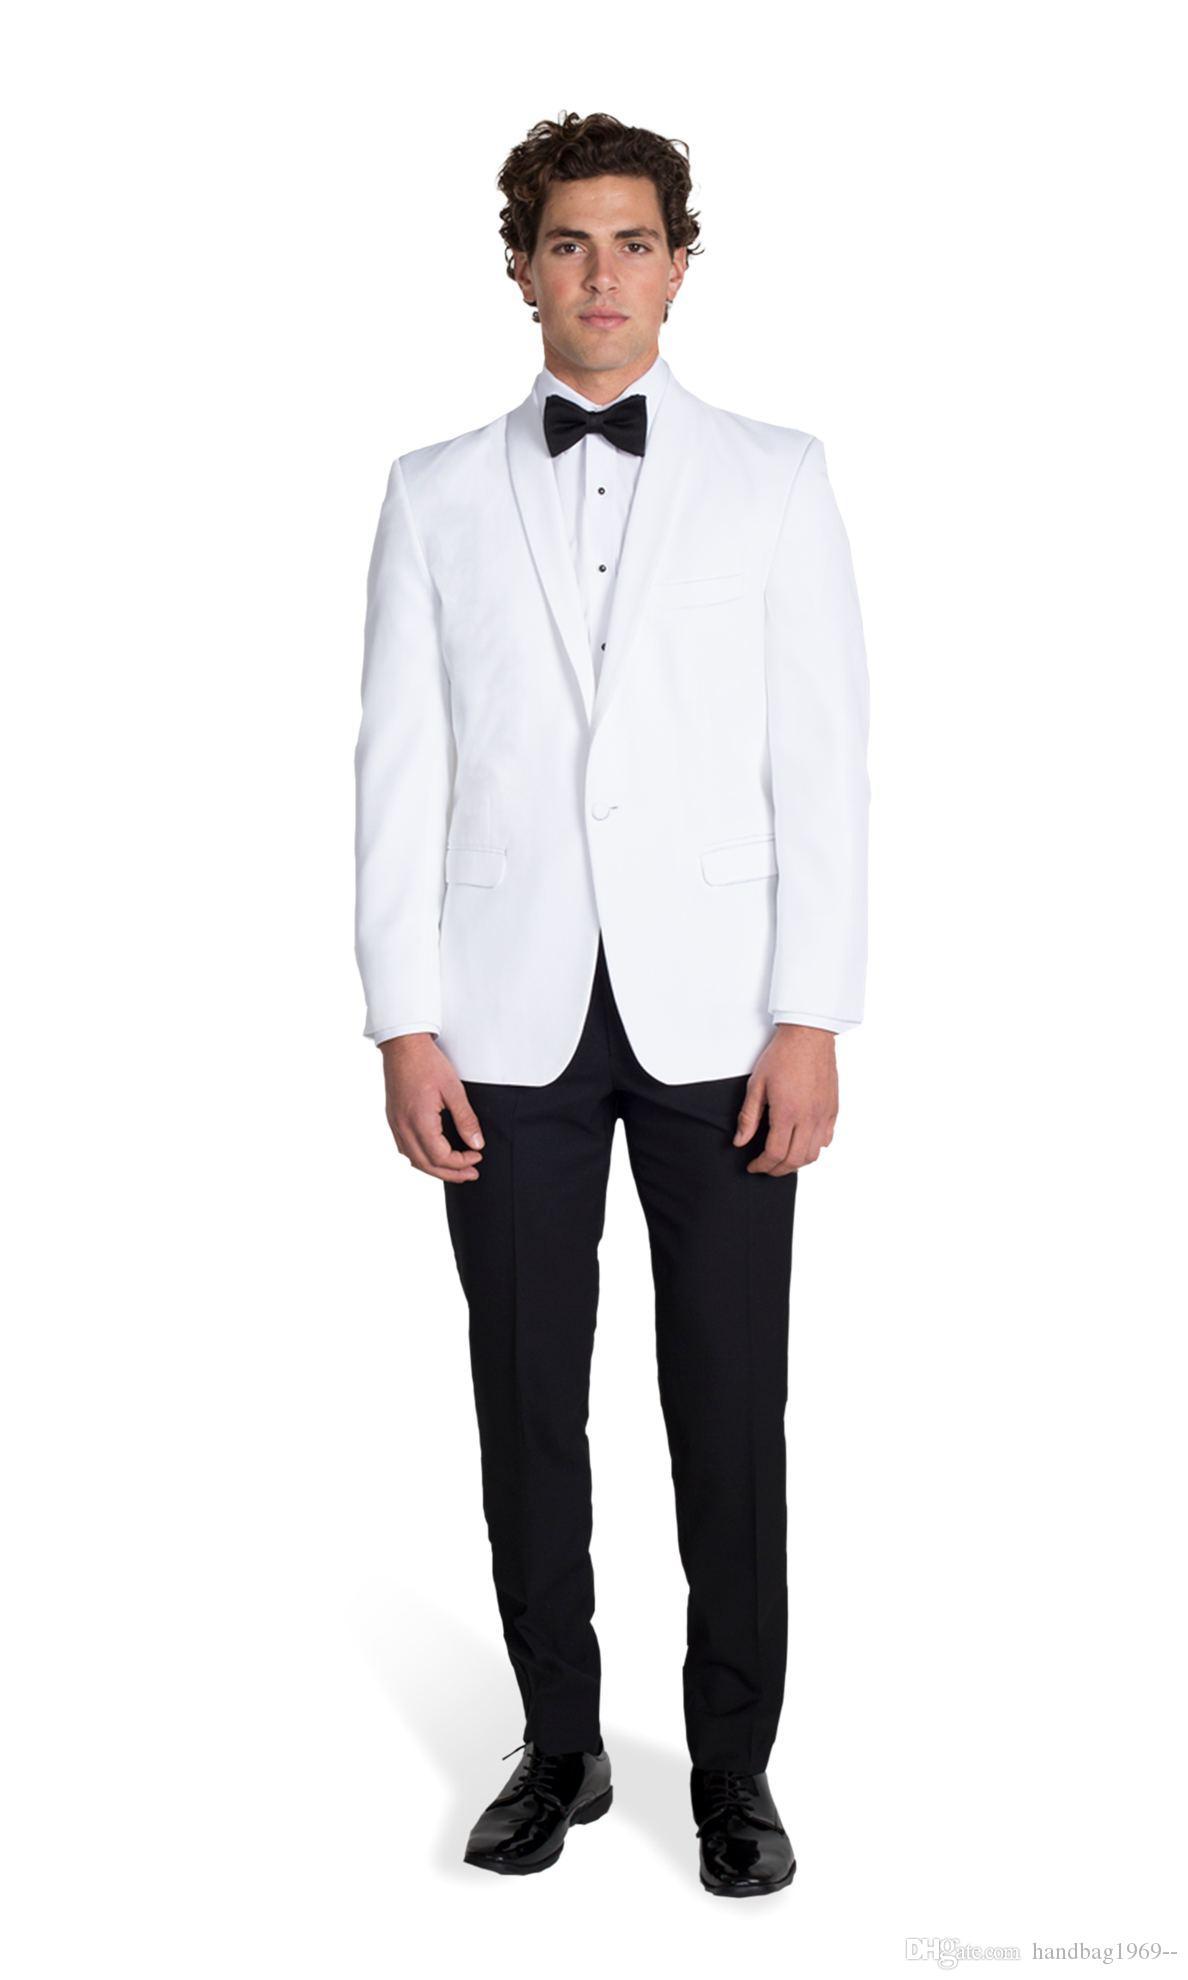 Nuovi arrivi One Button White Groom Smoking Scialle bavero Groomsmen Best Man Blazer Mens Abiti da sposa Jacket + Pants + Tie D: 355